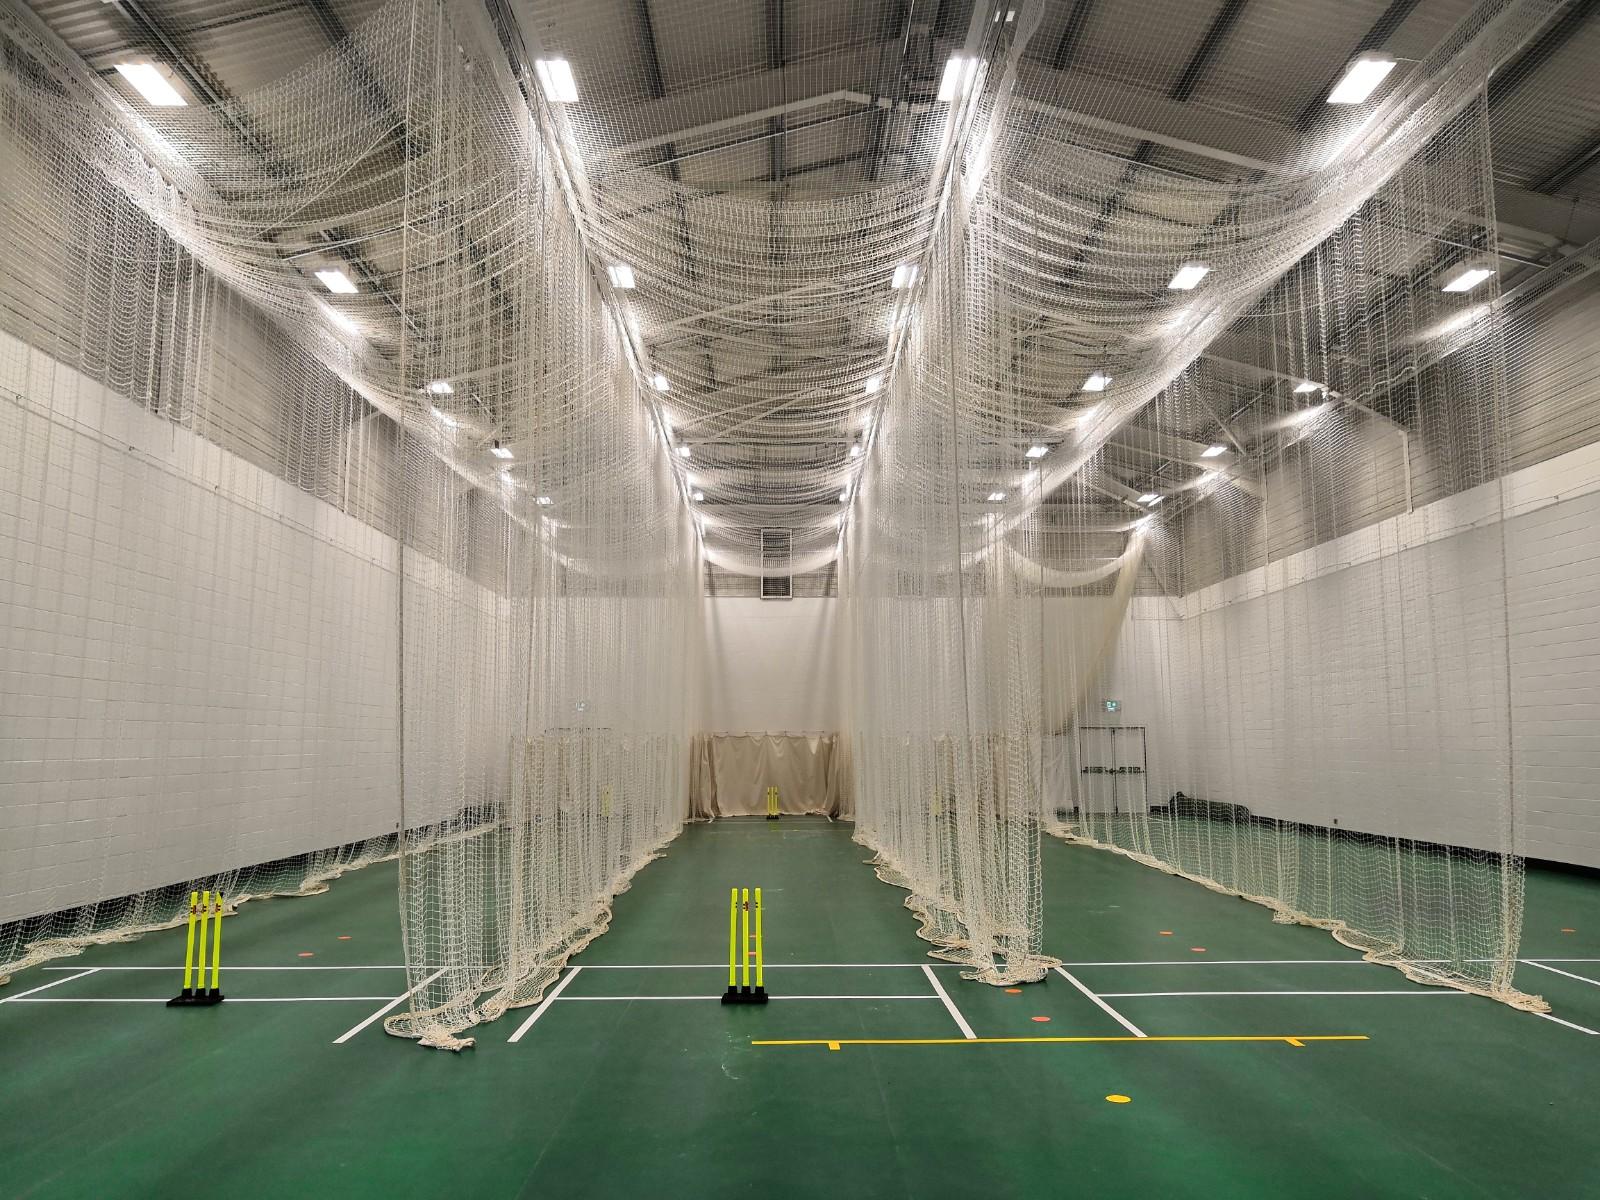 cricket_sport_and_leisure.jpg